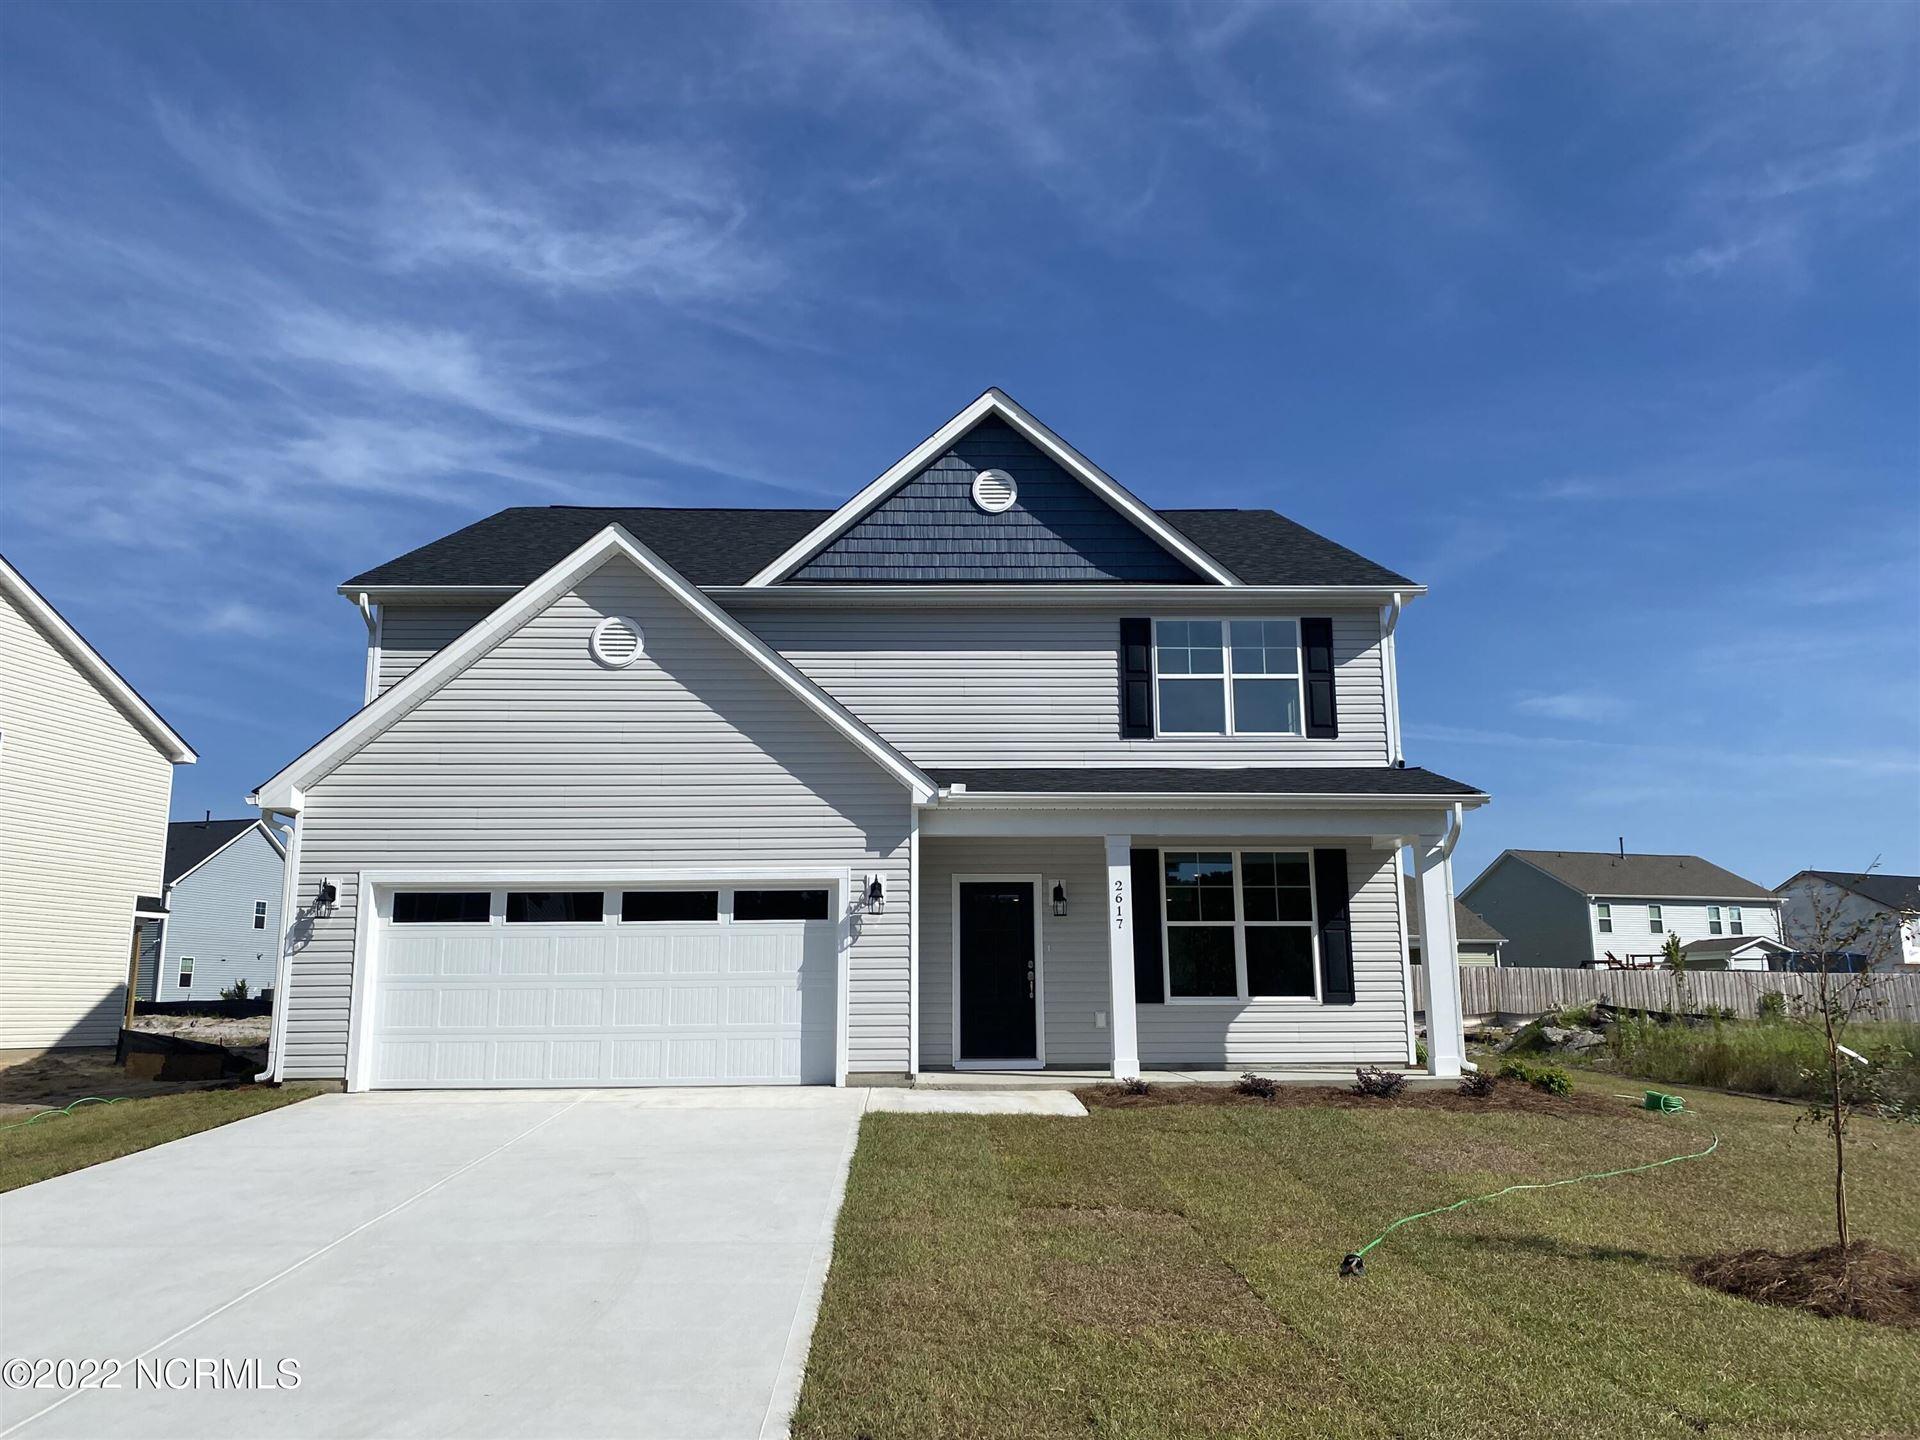 Photo for 2617 Longleaf Pine Circle, Leland, NC 28451 (MLS # 100281727)